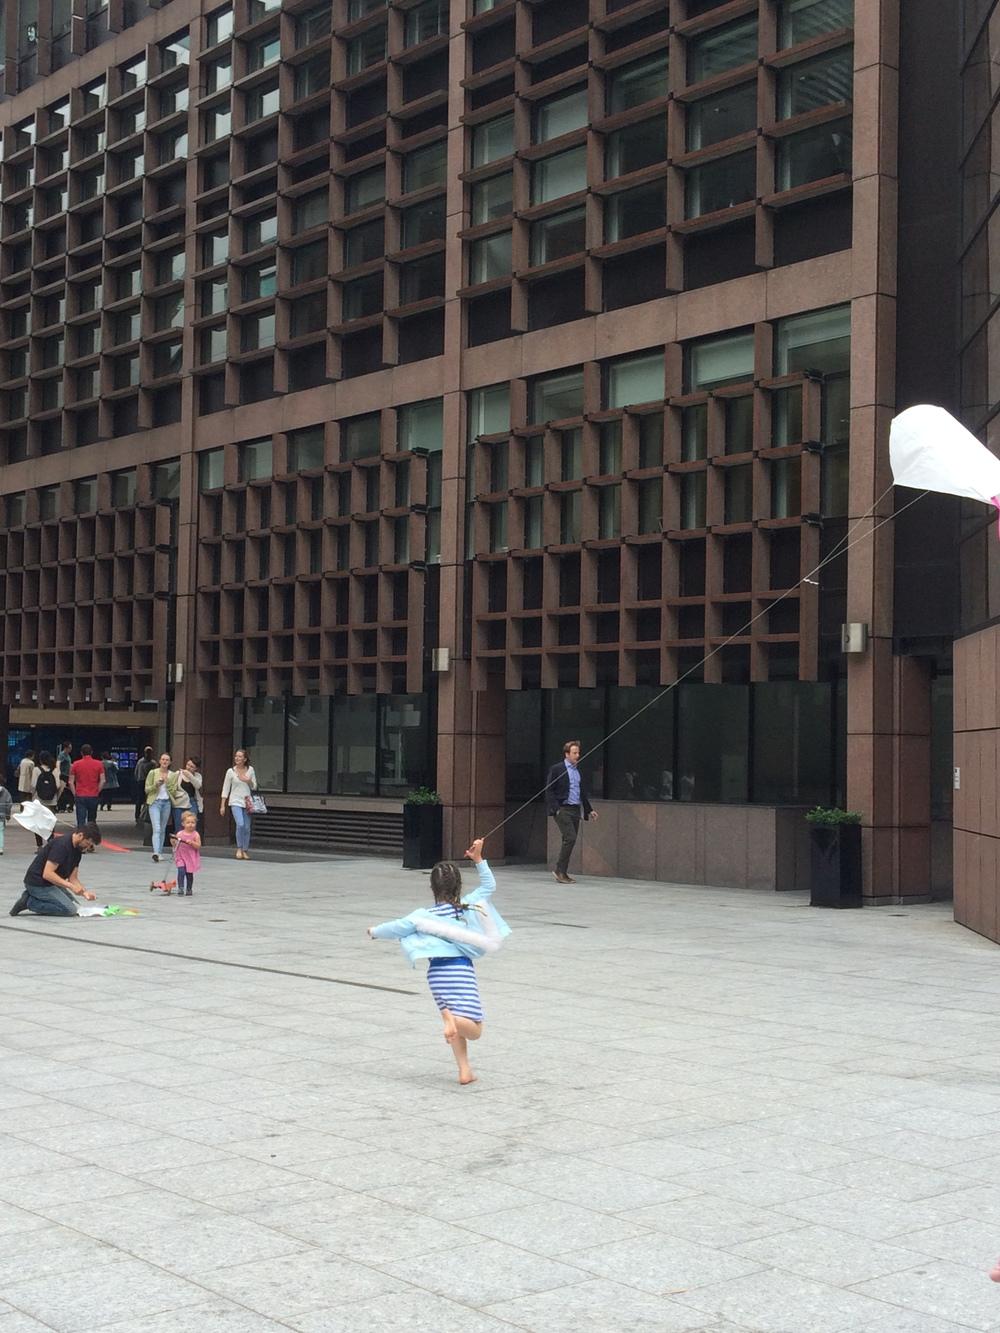 Photo 25-07-2015 15 08 50.jpg